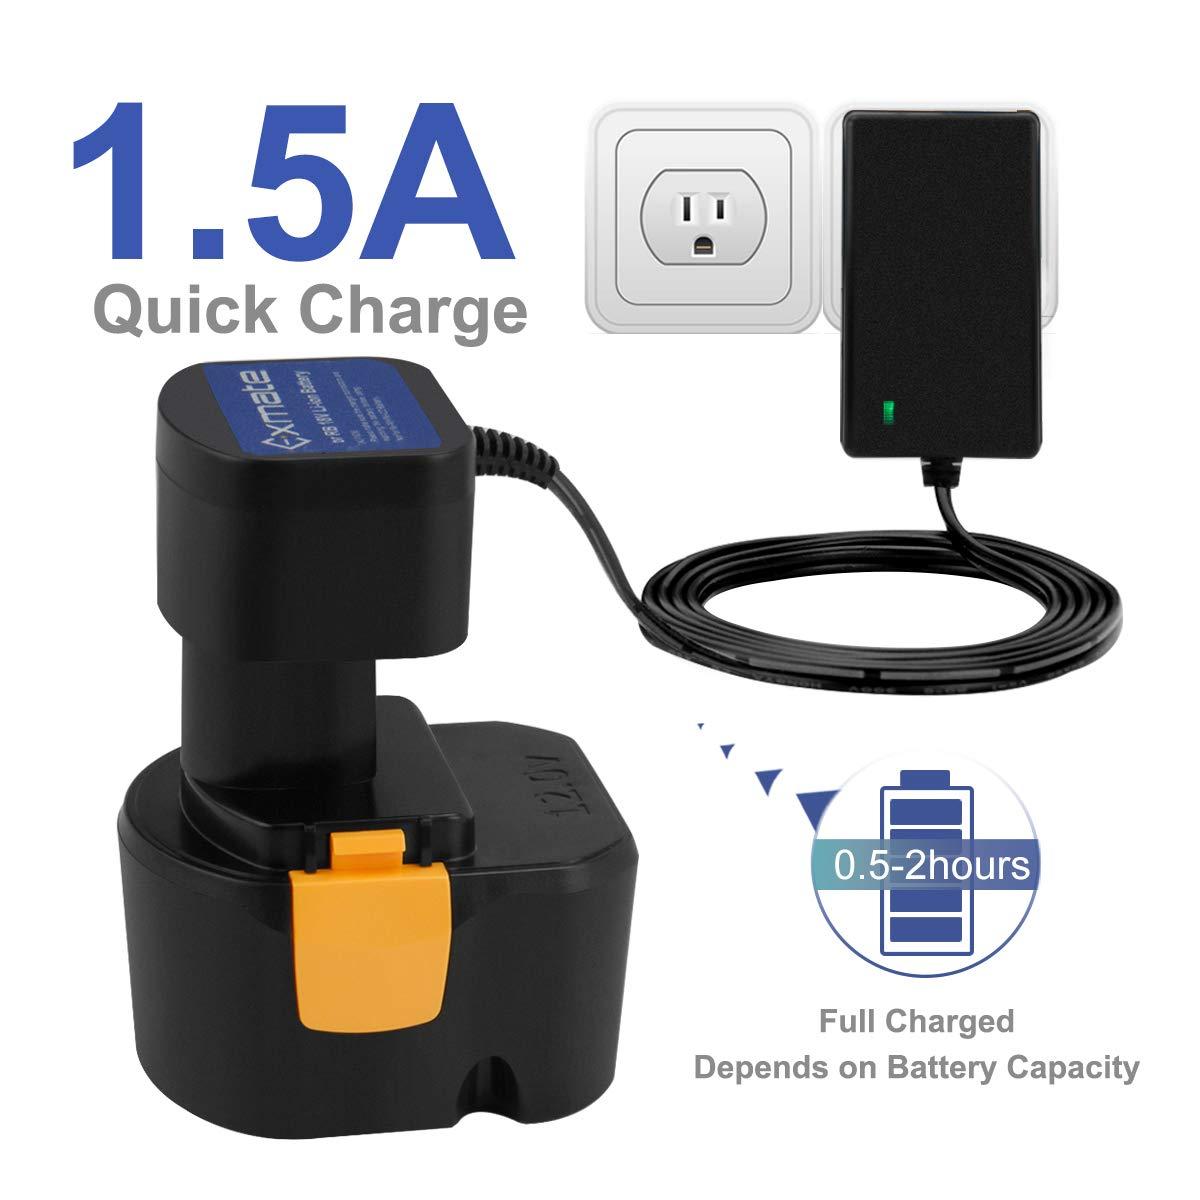 Exmate 1.2V-18V Multivolt Ryobi Battery Charger